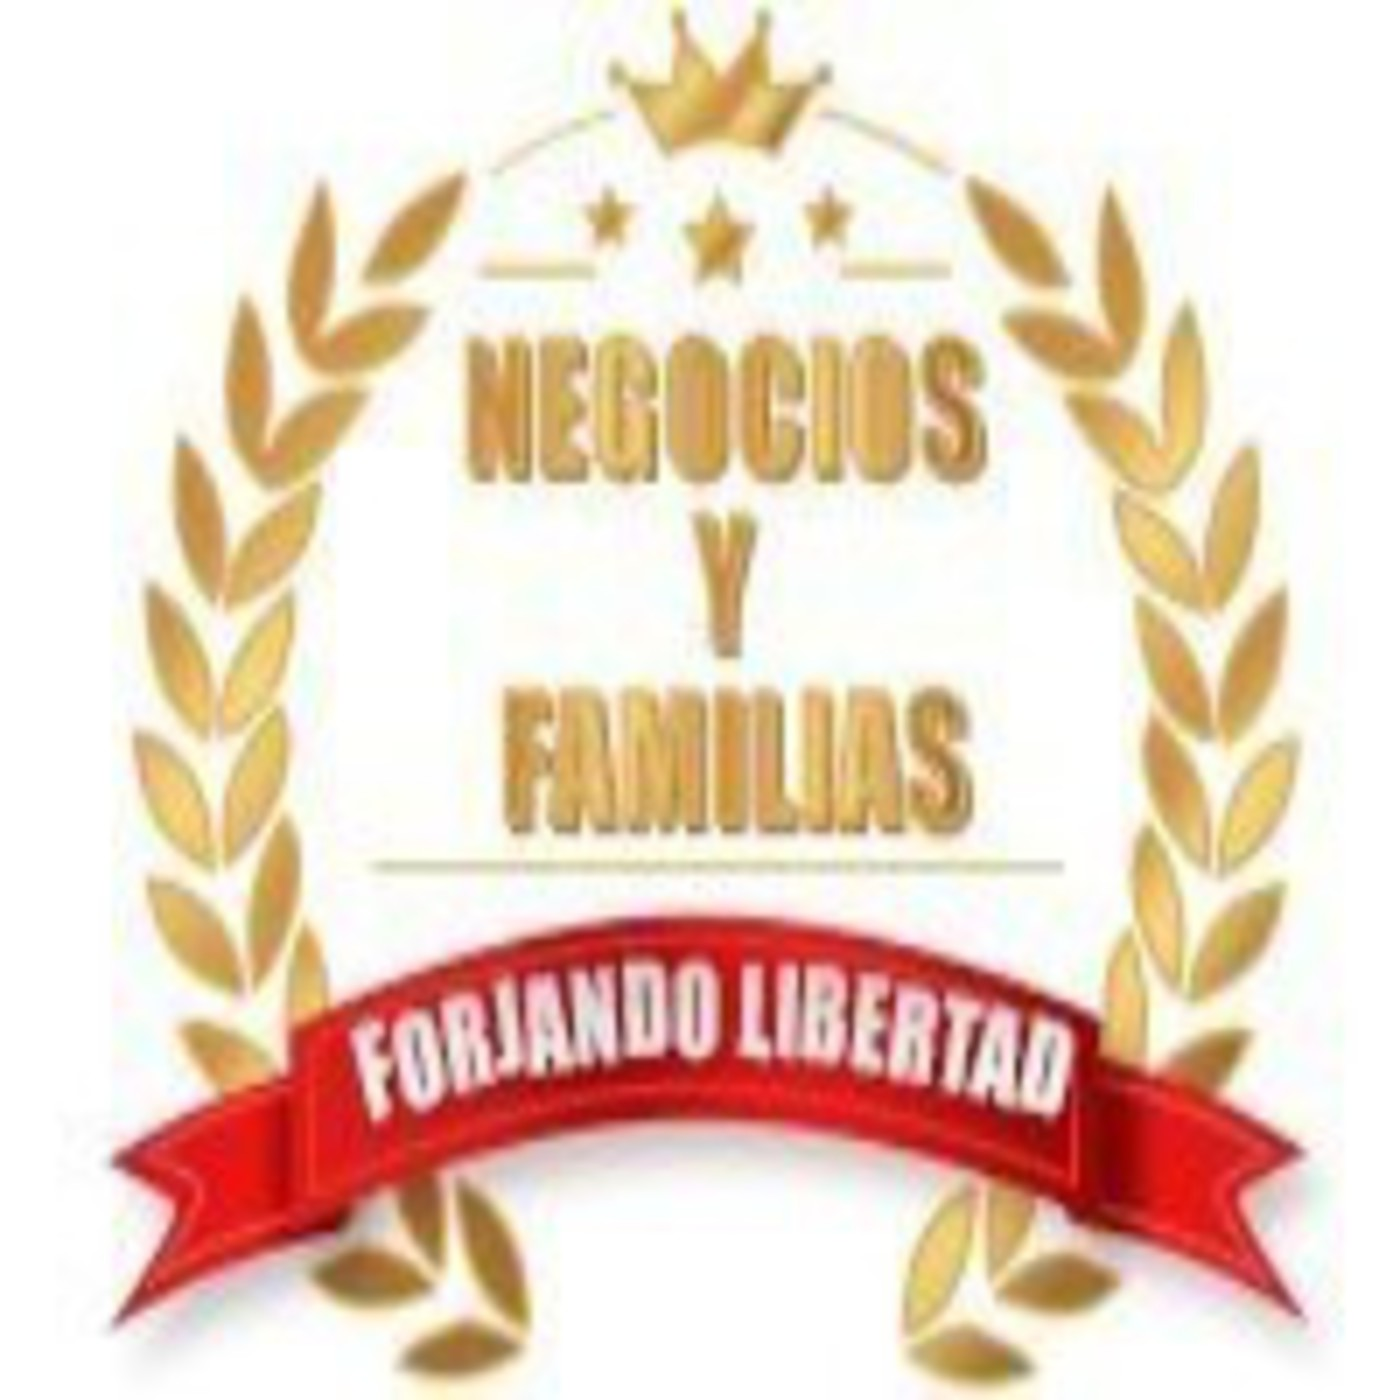 Lourdes Enriquez - Liderazgo Aplicado